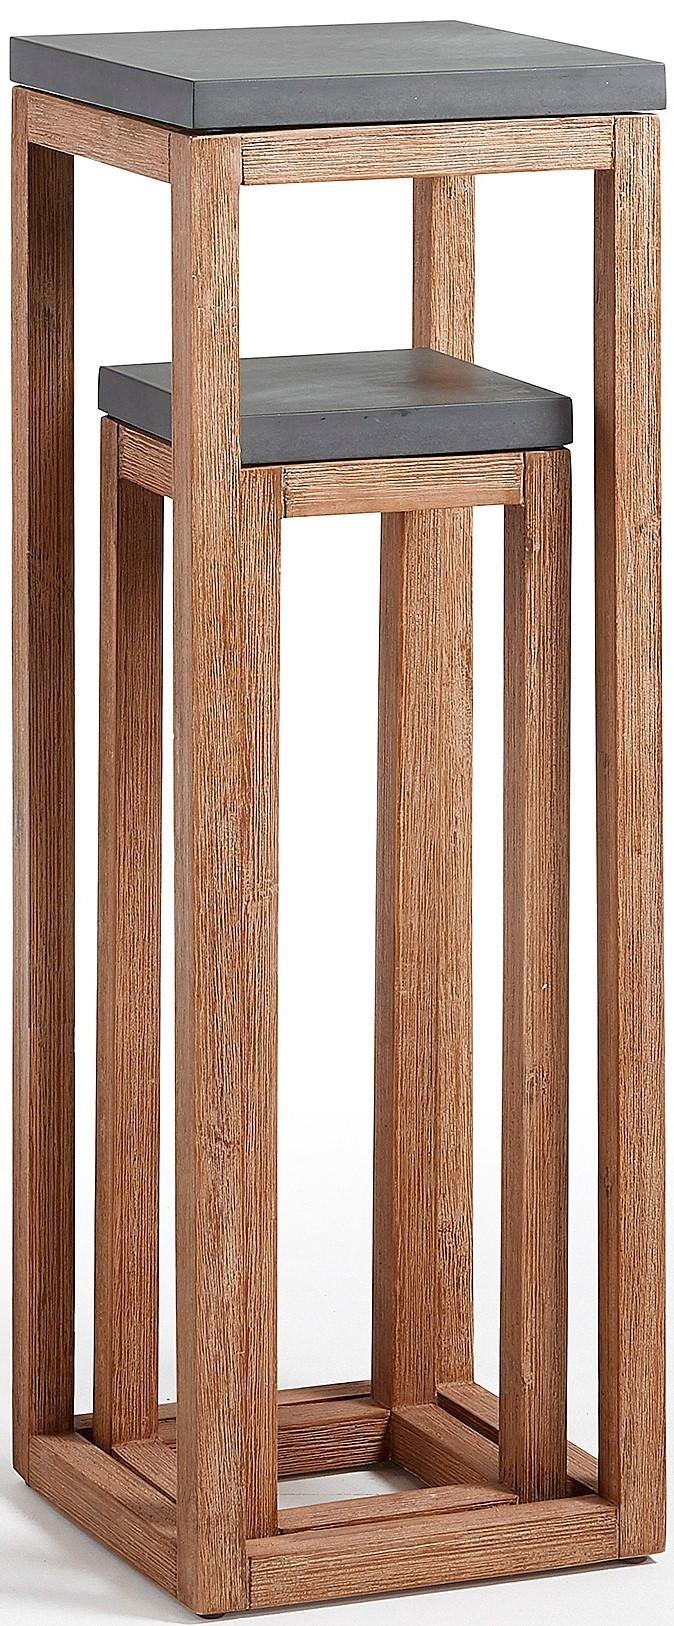 Fioriere per interni design vasi di design by teresa for Fioriera verticale ikea